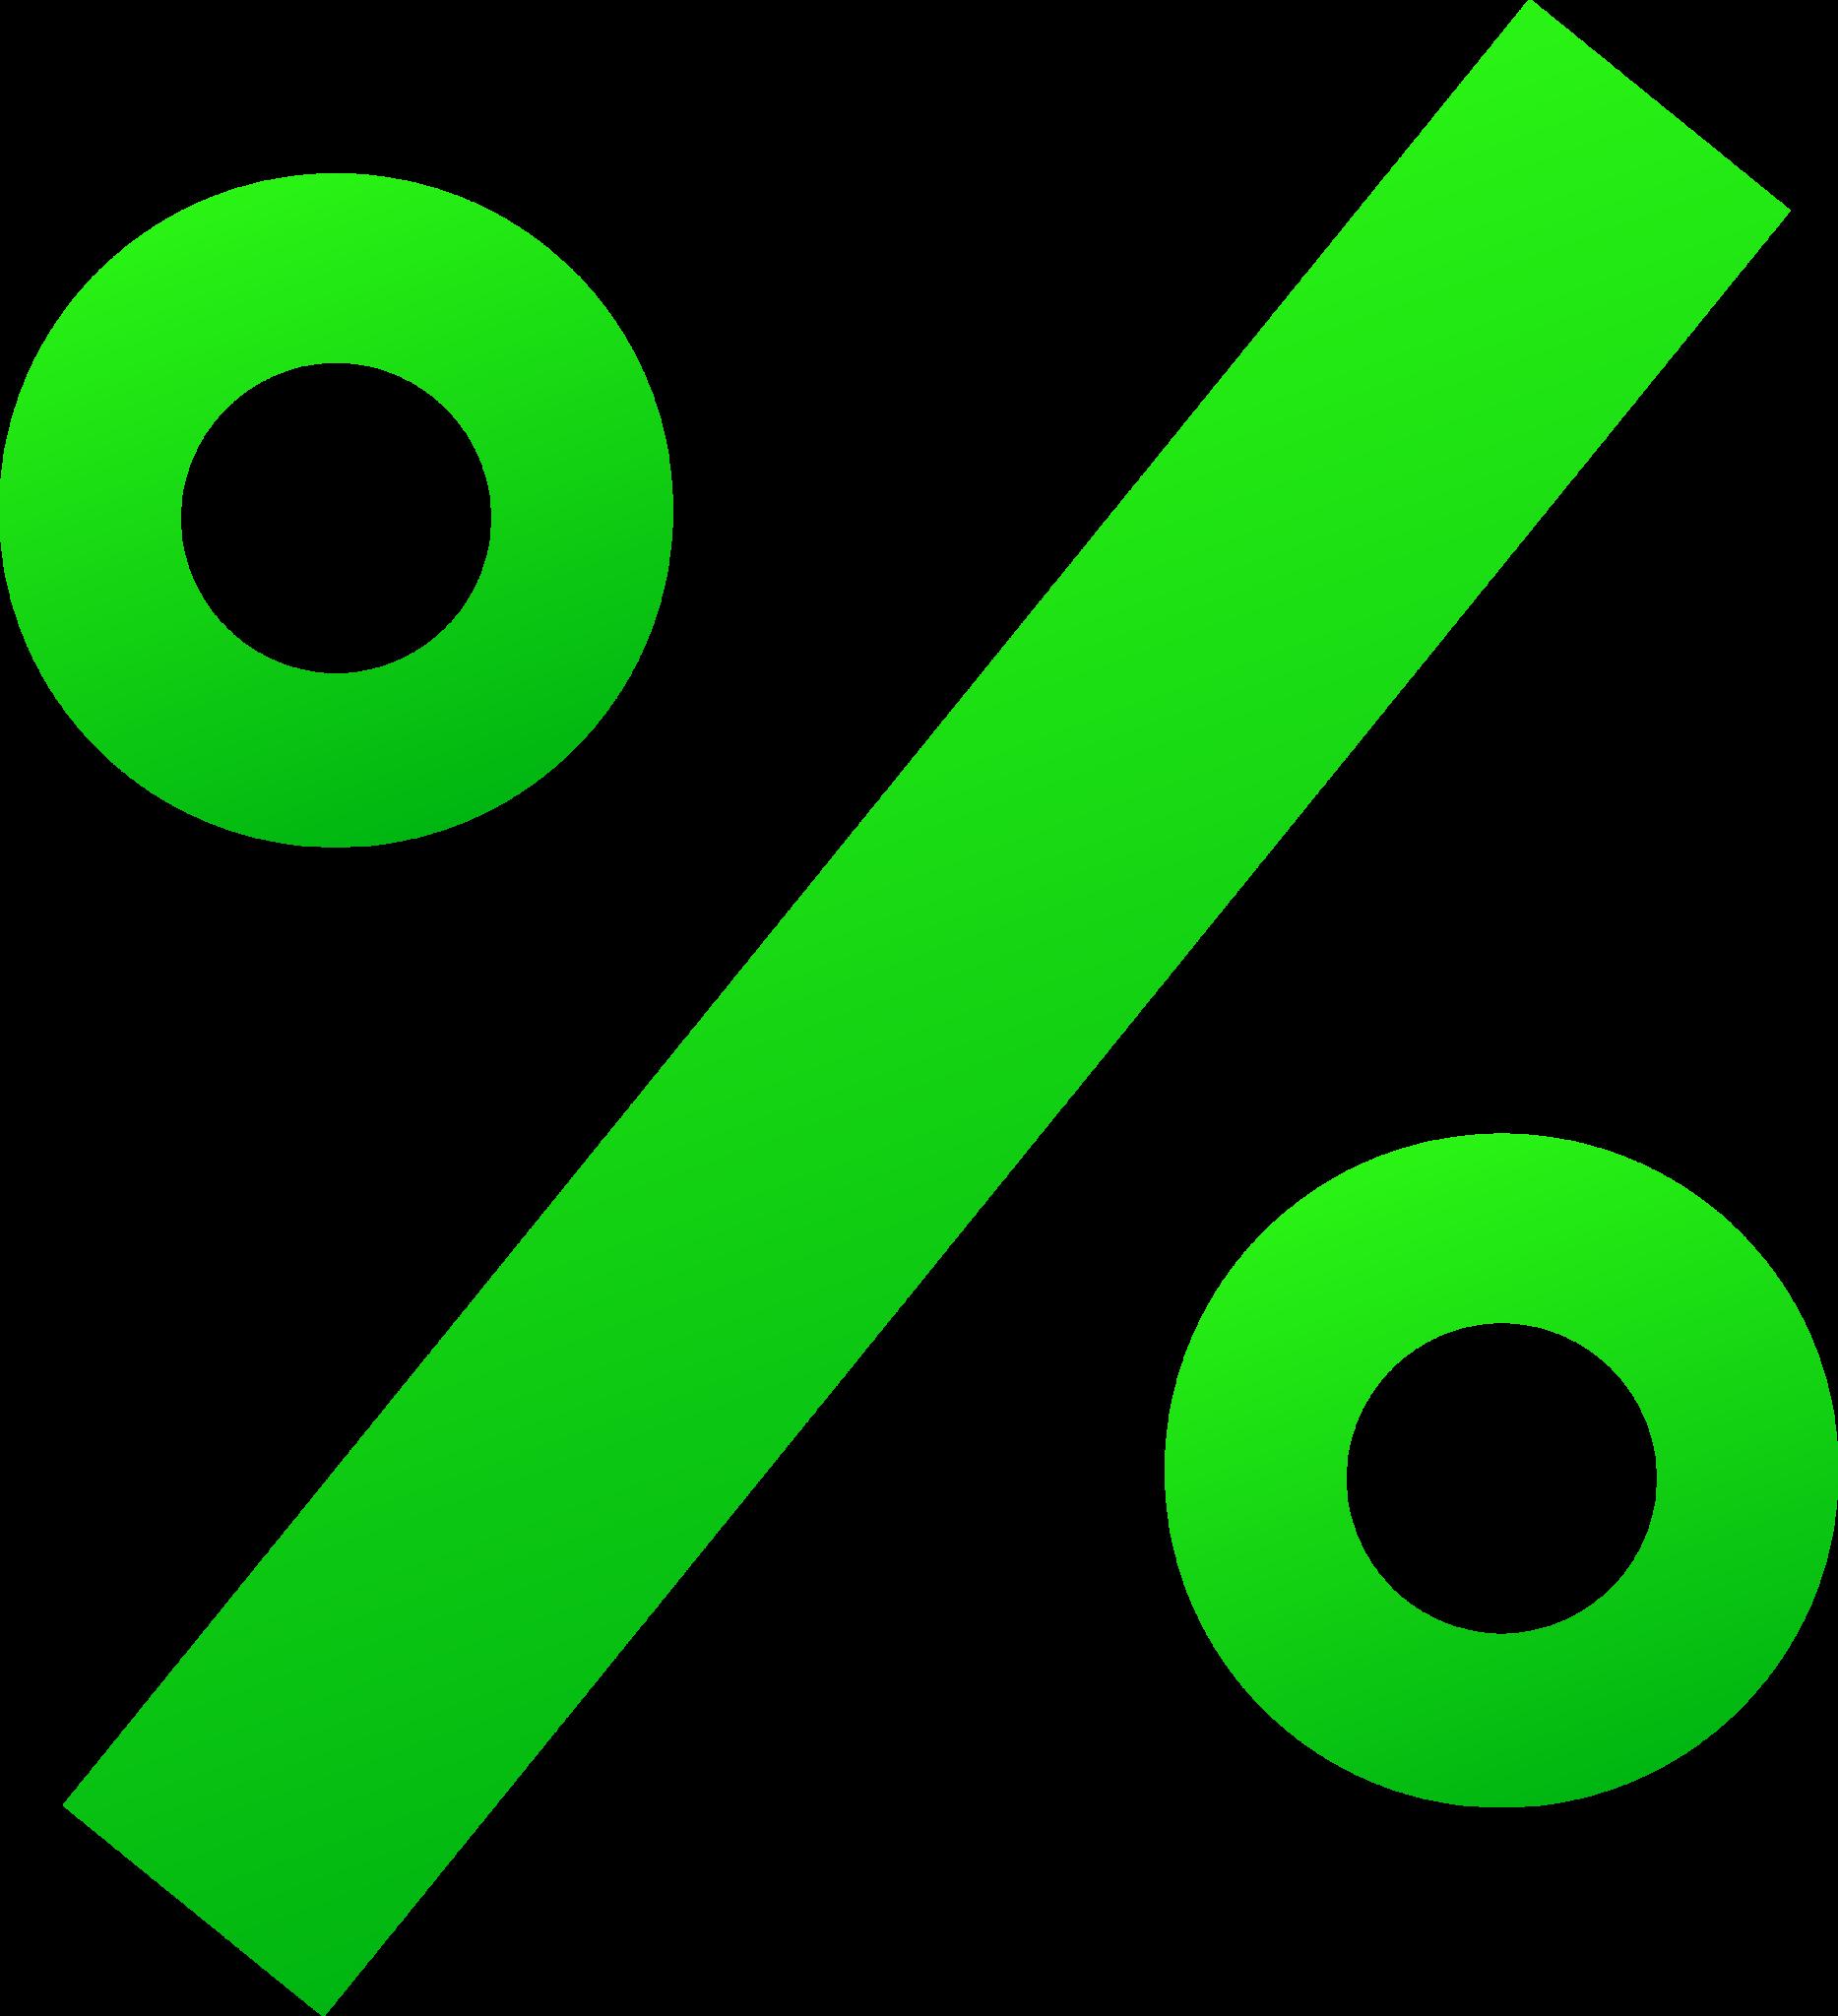 Test clipart aptitude. Preparation tips percentage trick